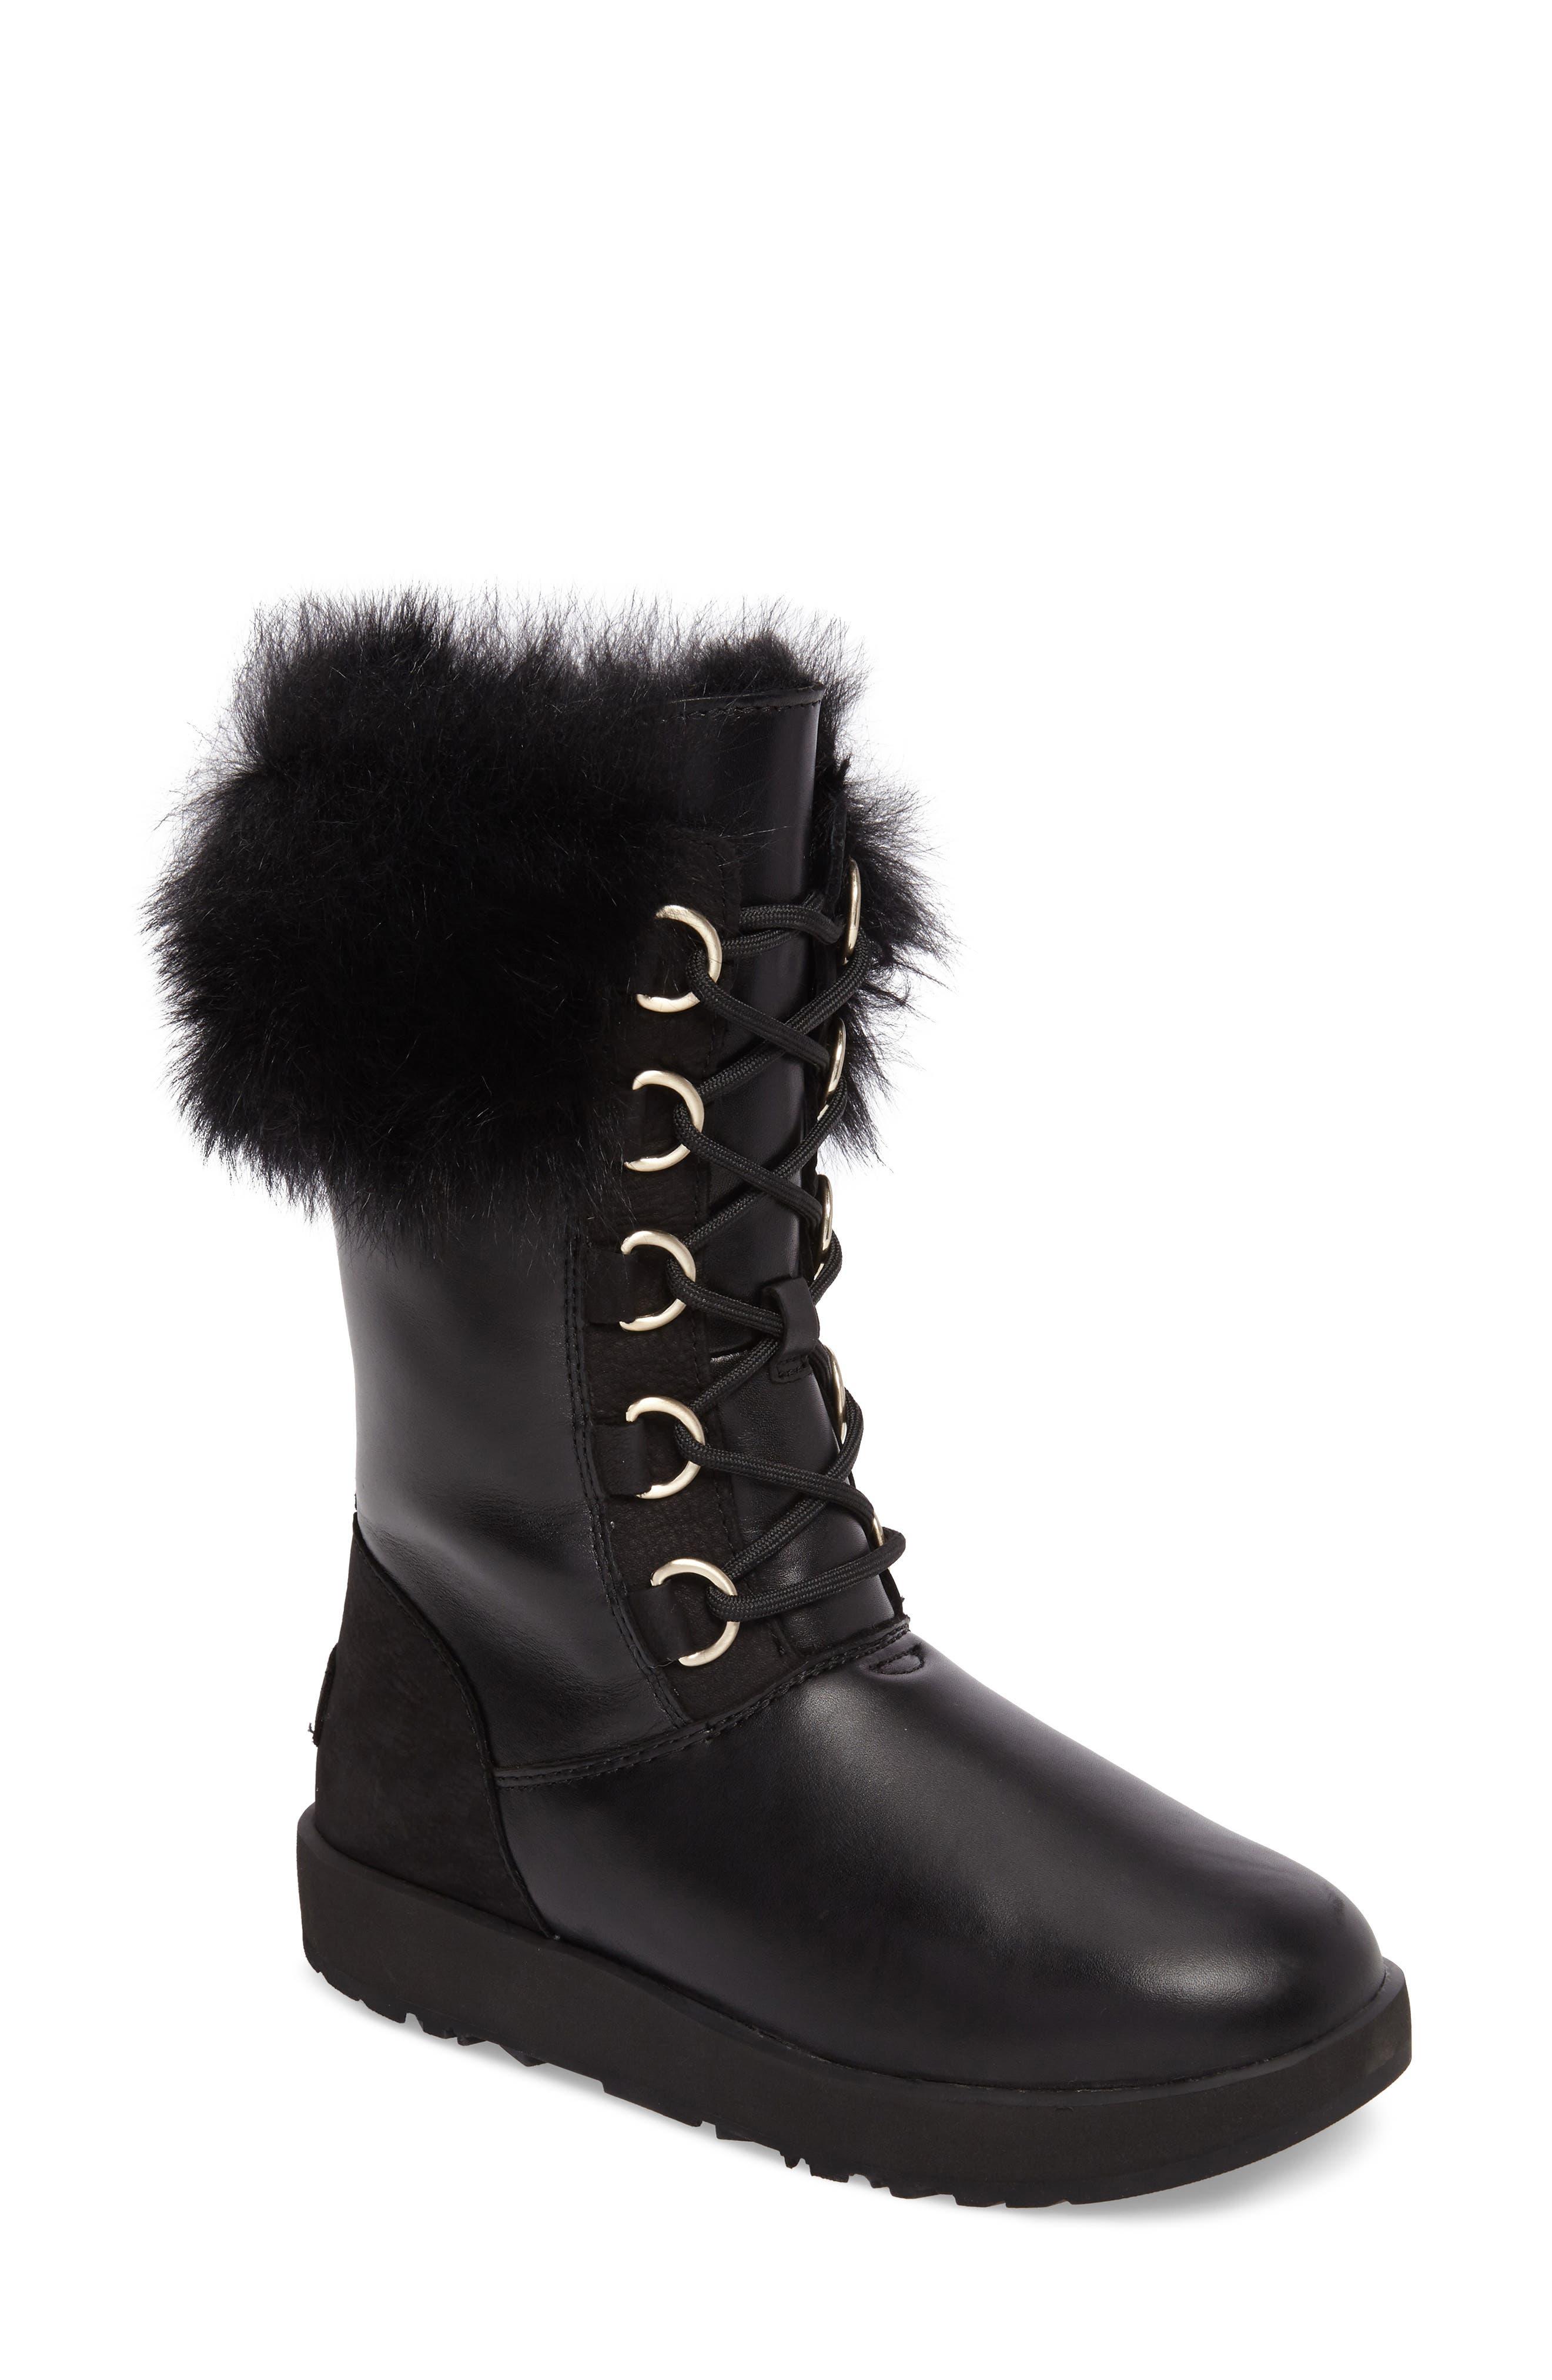 Main Image - UGG® Aya Waterproof Snow Boot (Women)